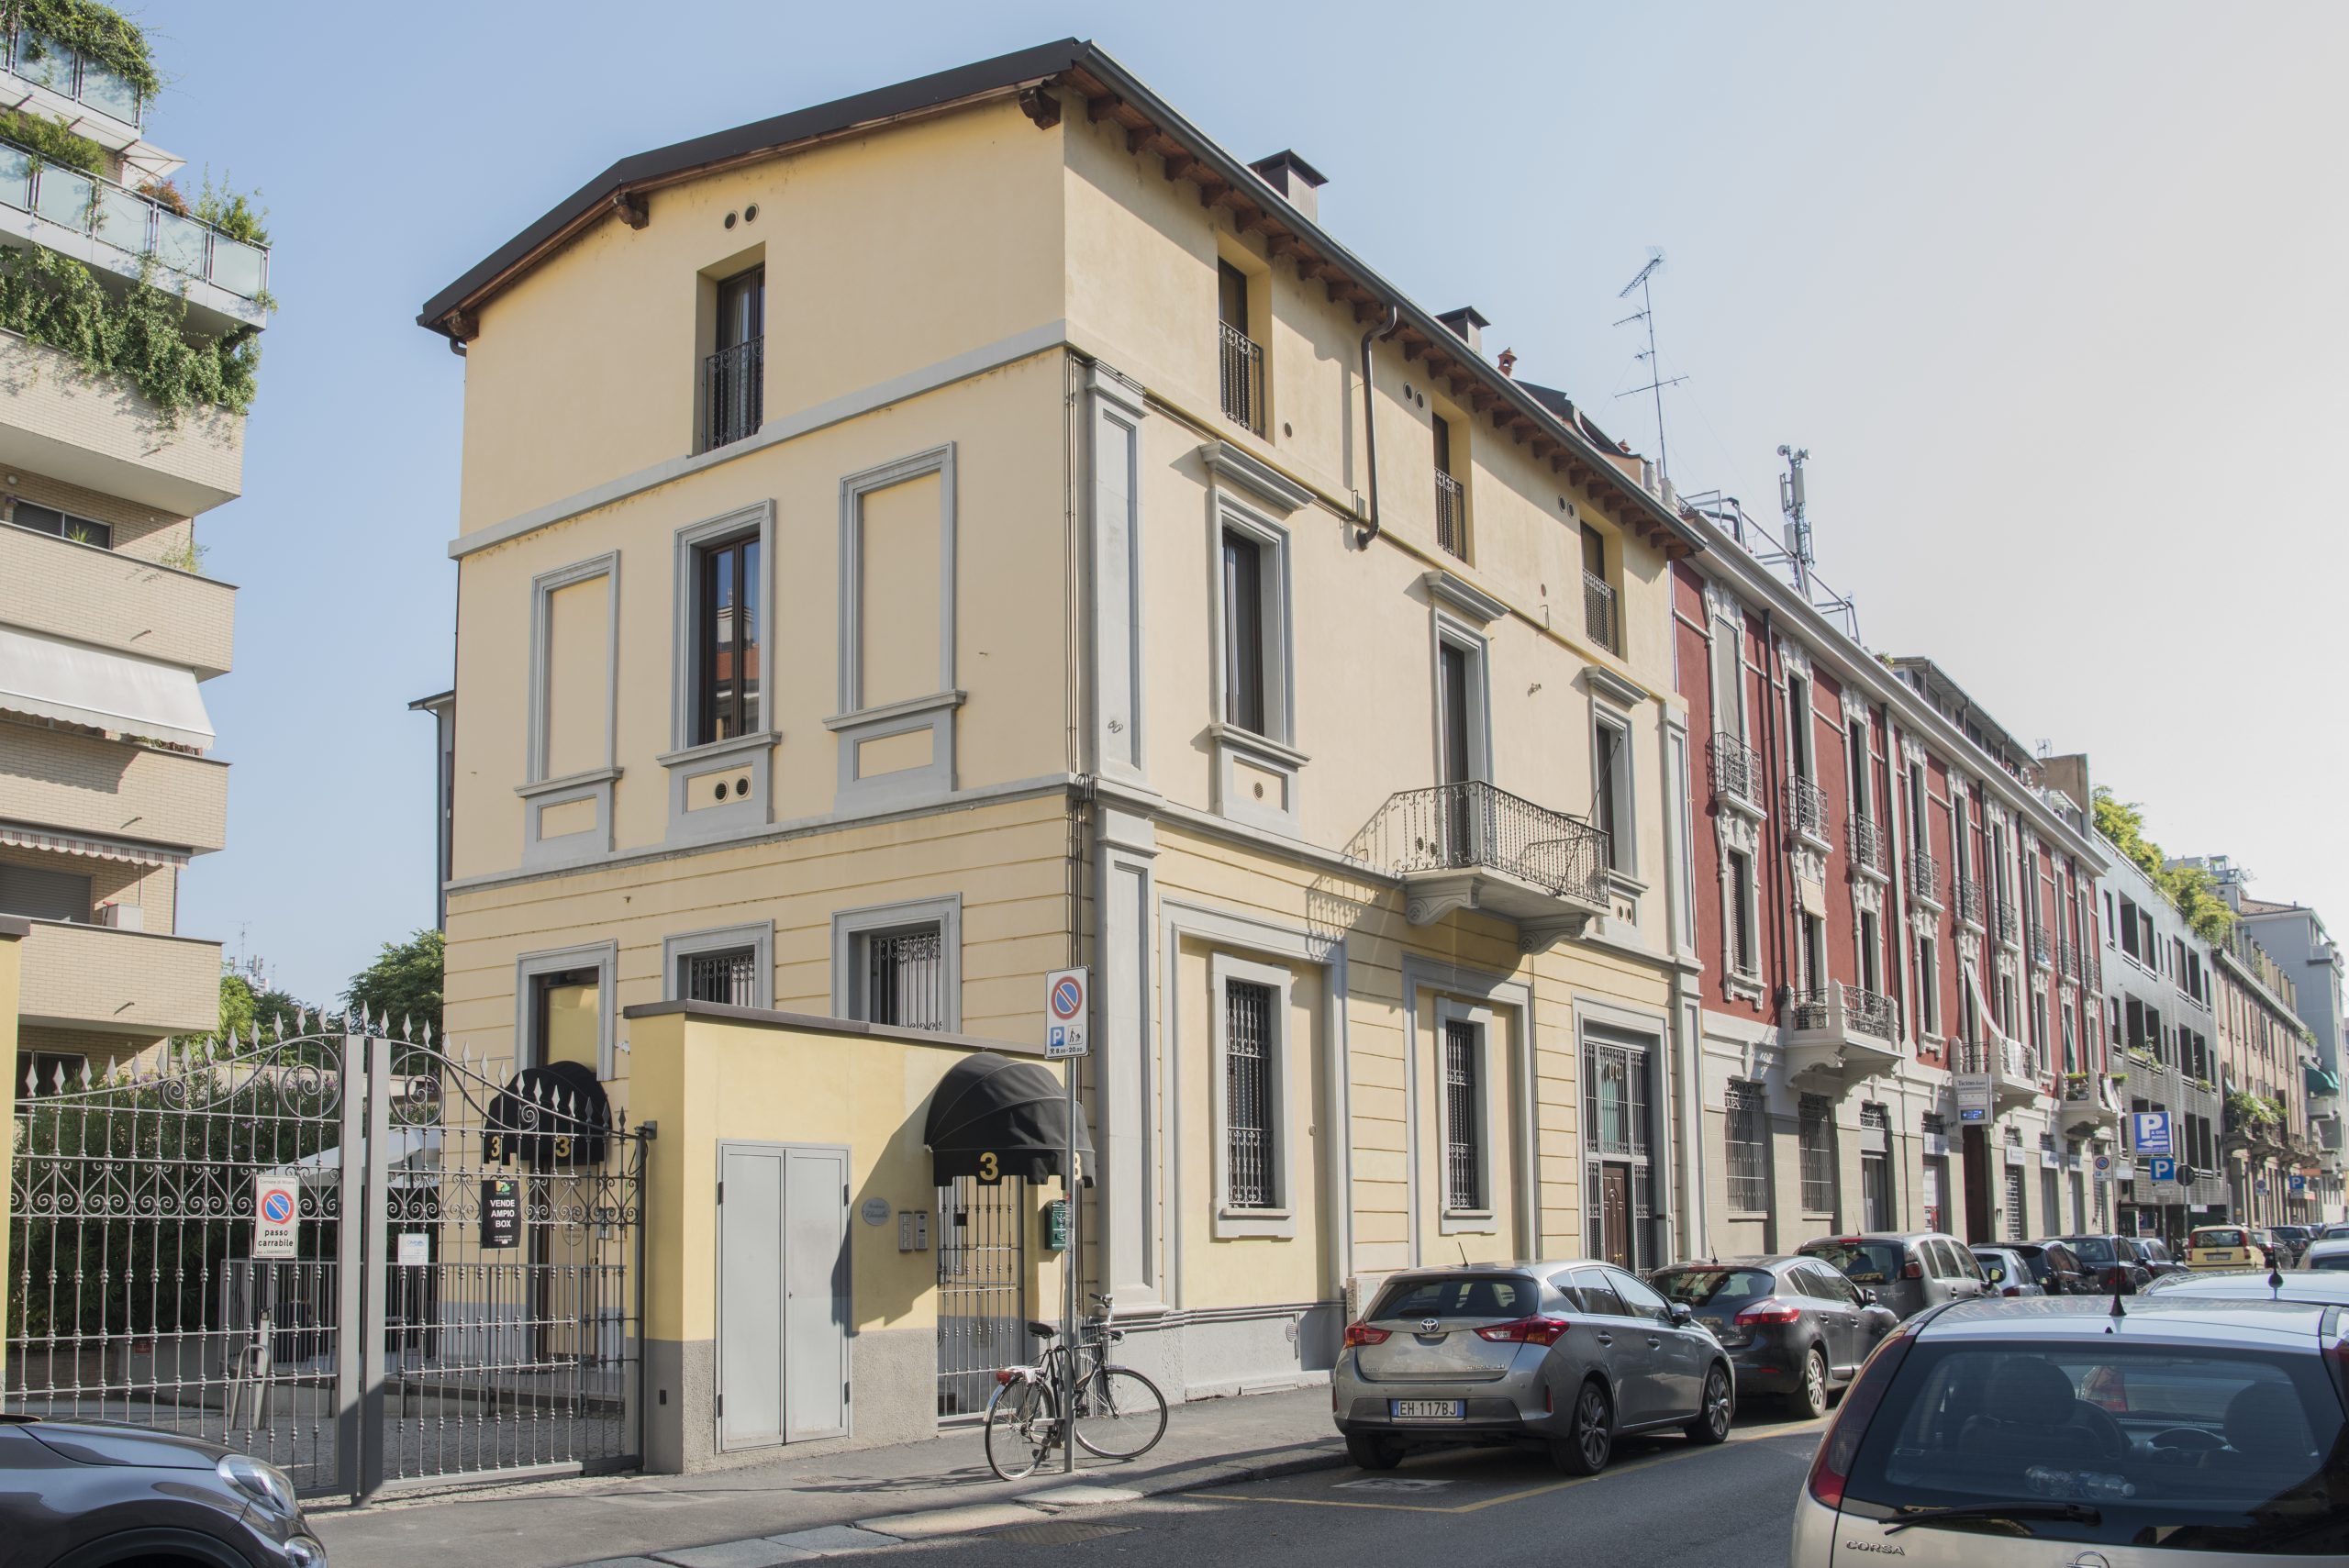 palazzo centrale residence chiaralba